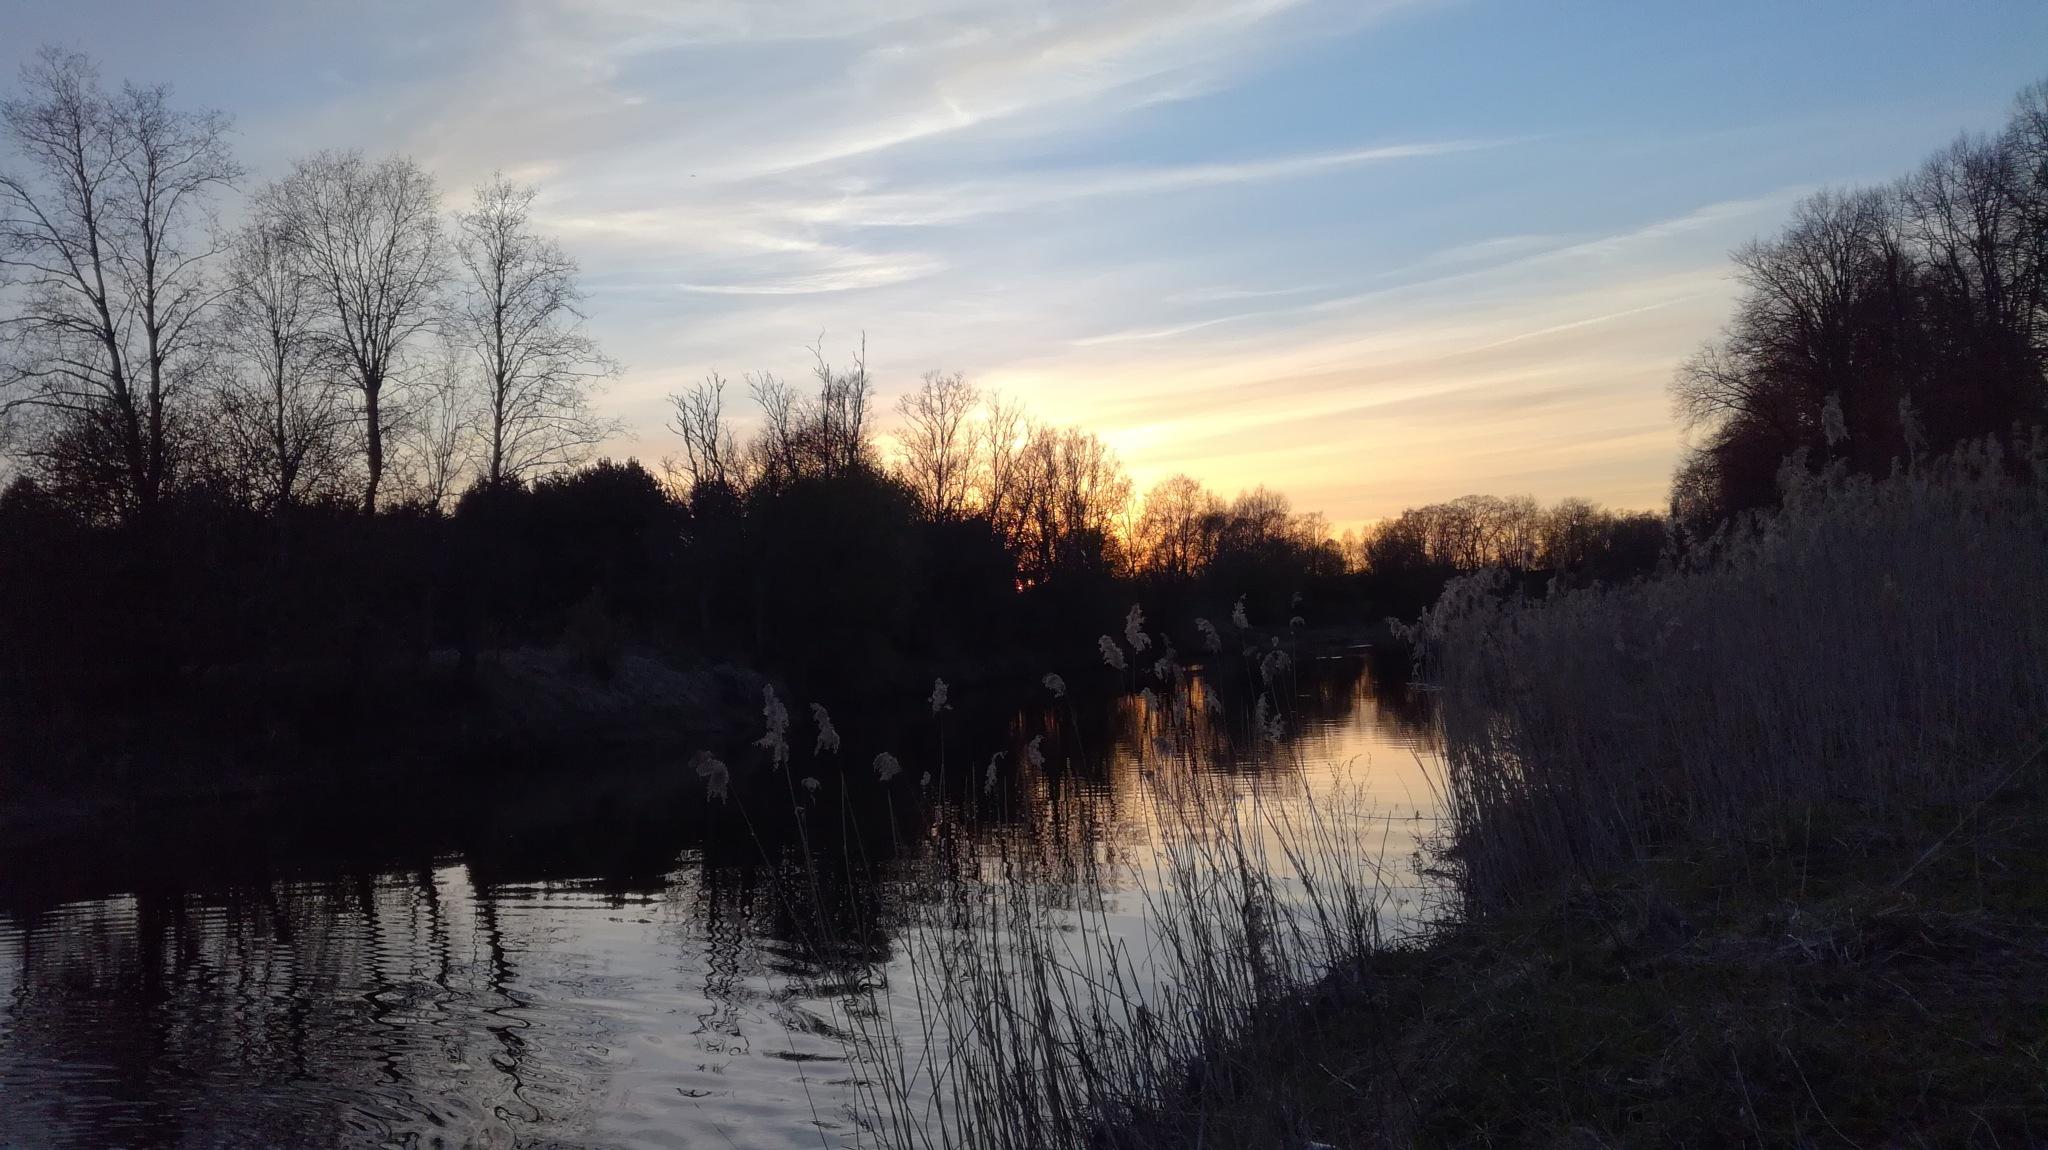 Sunset colors by uzkuraitiene62